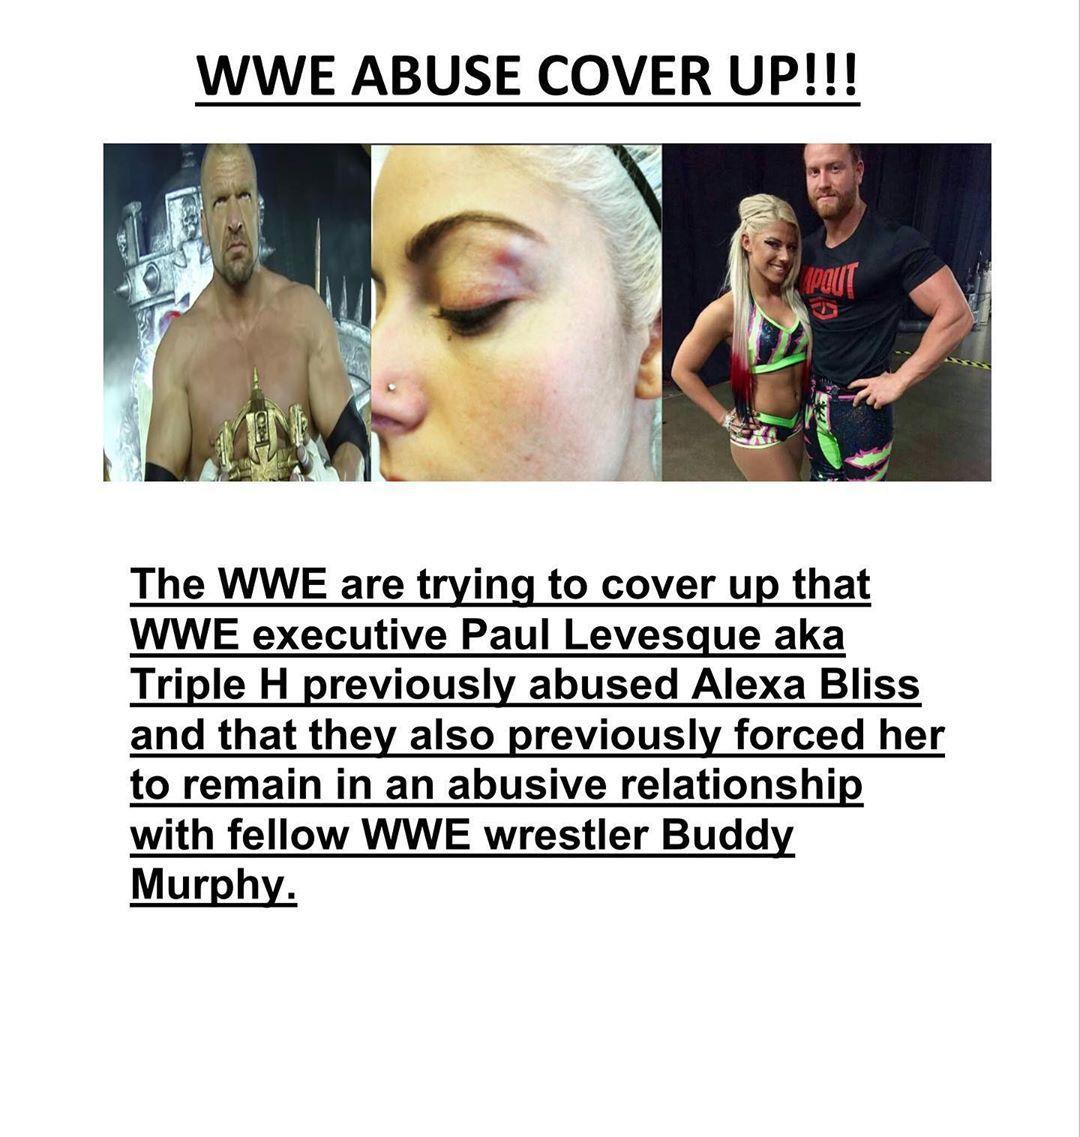 #WWE #smackdown #wweraw #wwenxt #wwebackstage #wweuniverse #wrestling #wwenews #NXTTakeover #NXTTakeoverInYourHouse #InYourHouse  #news #break #breaking #breakingnews #viral #metoo #WrestlingCommunity #instadaily #instagood #insta #thursday #tv #television #instagram #wwenews #wwebacklash #wrestlingnews #sport #alexabliss #boycottwwe